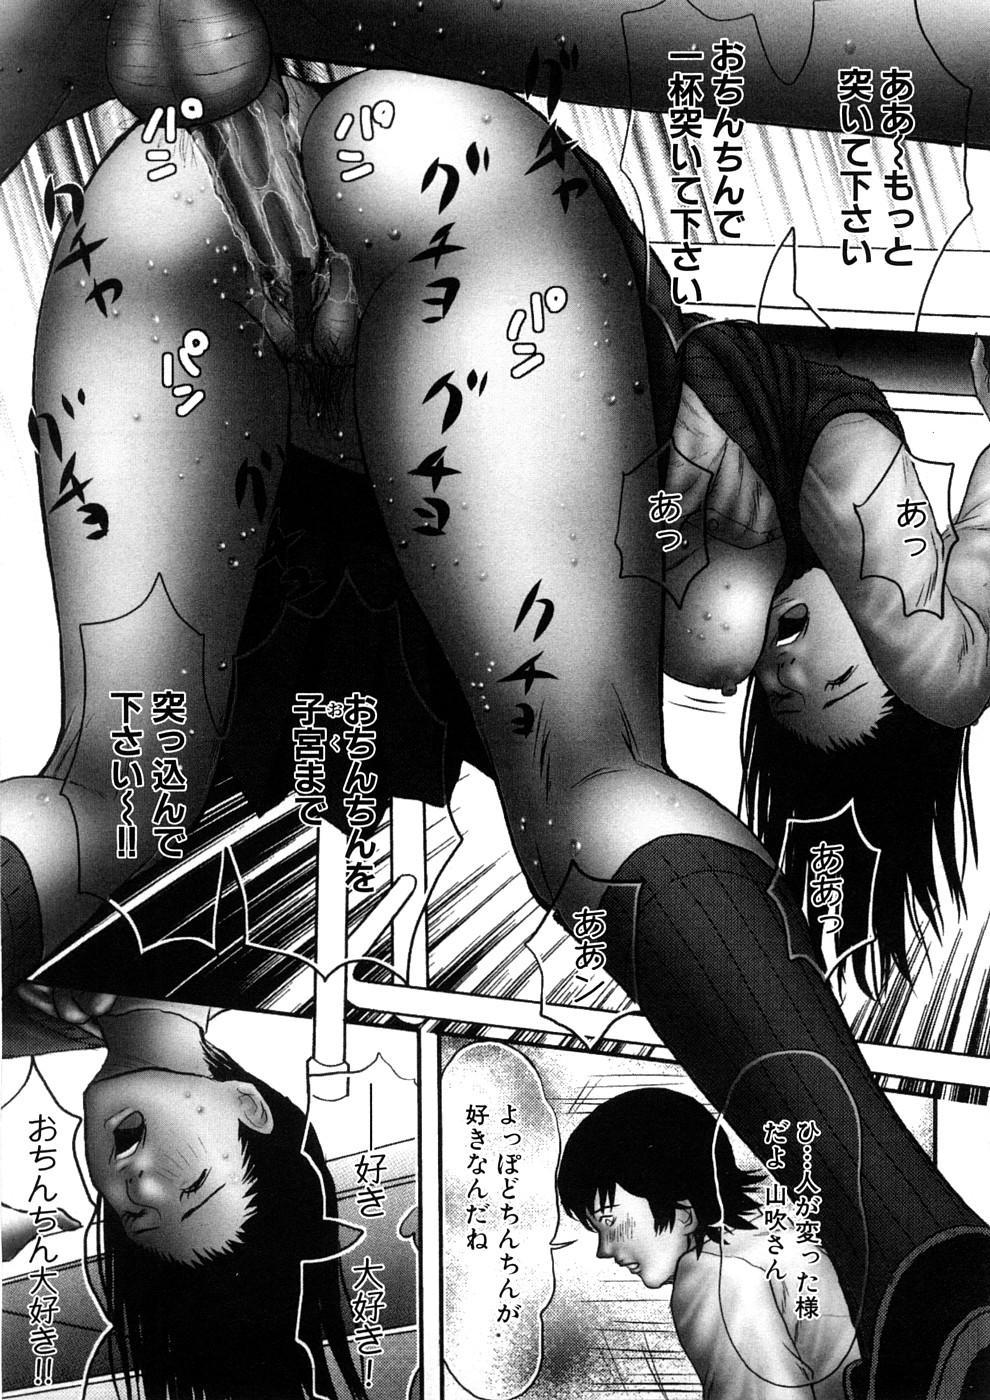 Geki Yaba Anthology Vol. 1 - Naka ni Dashite yo 231